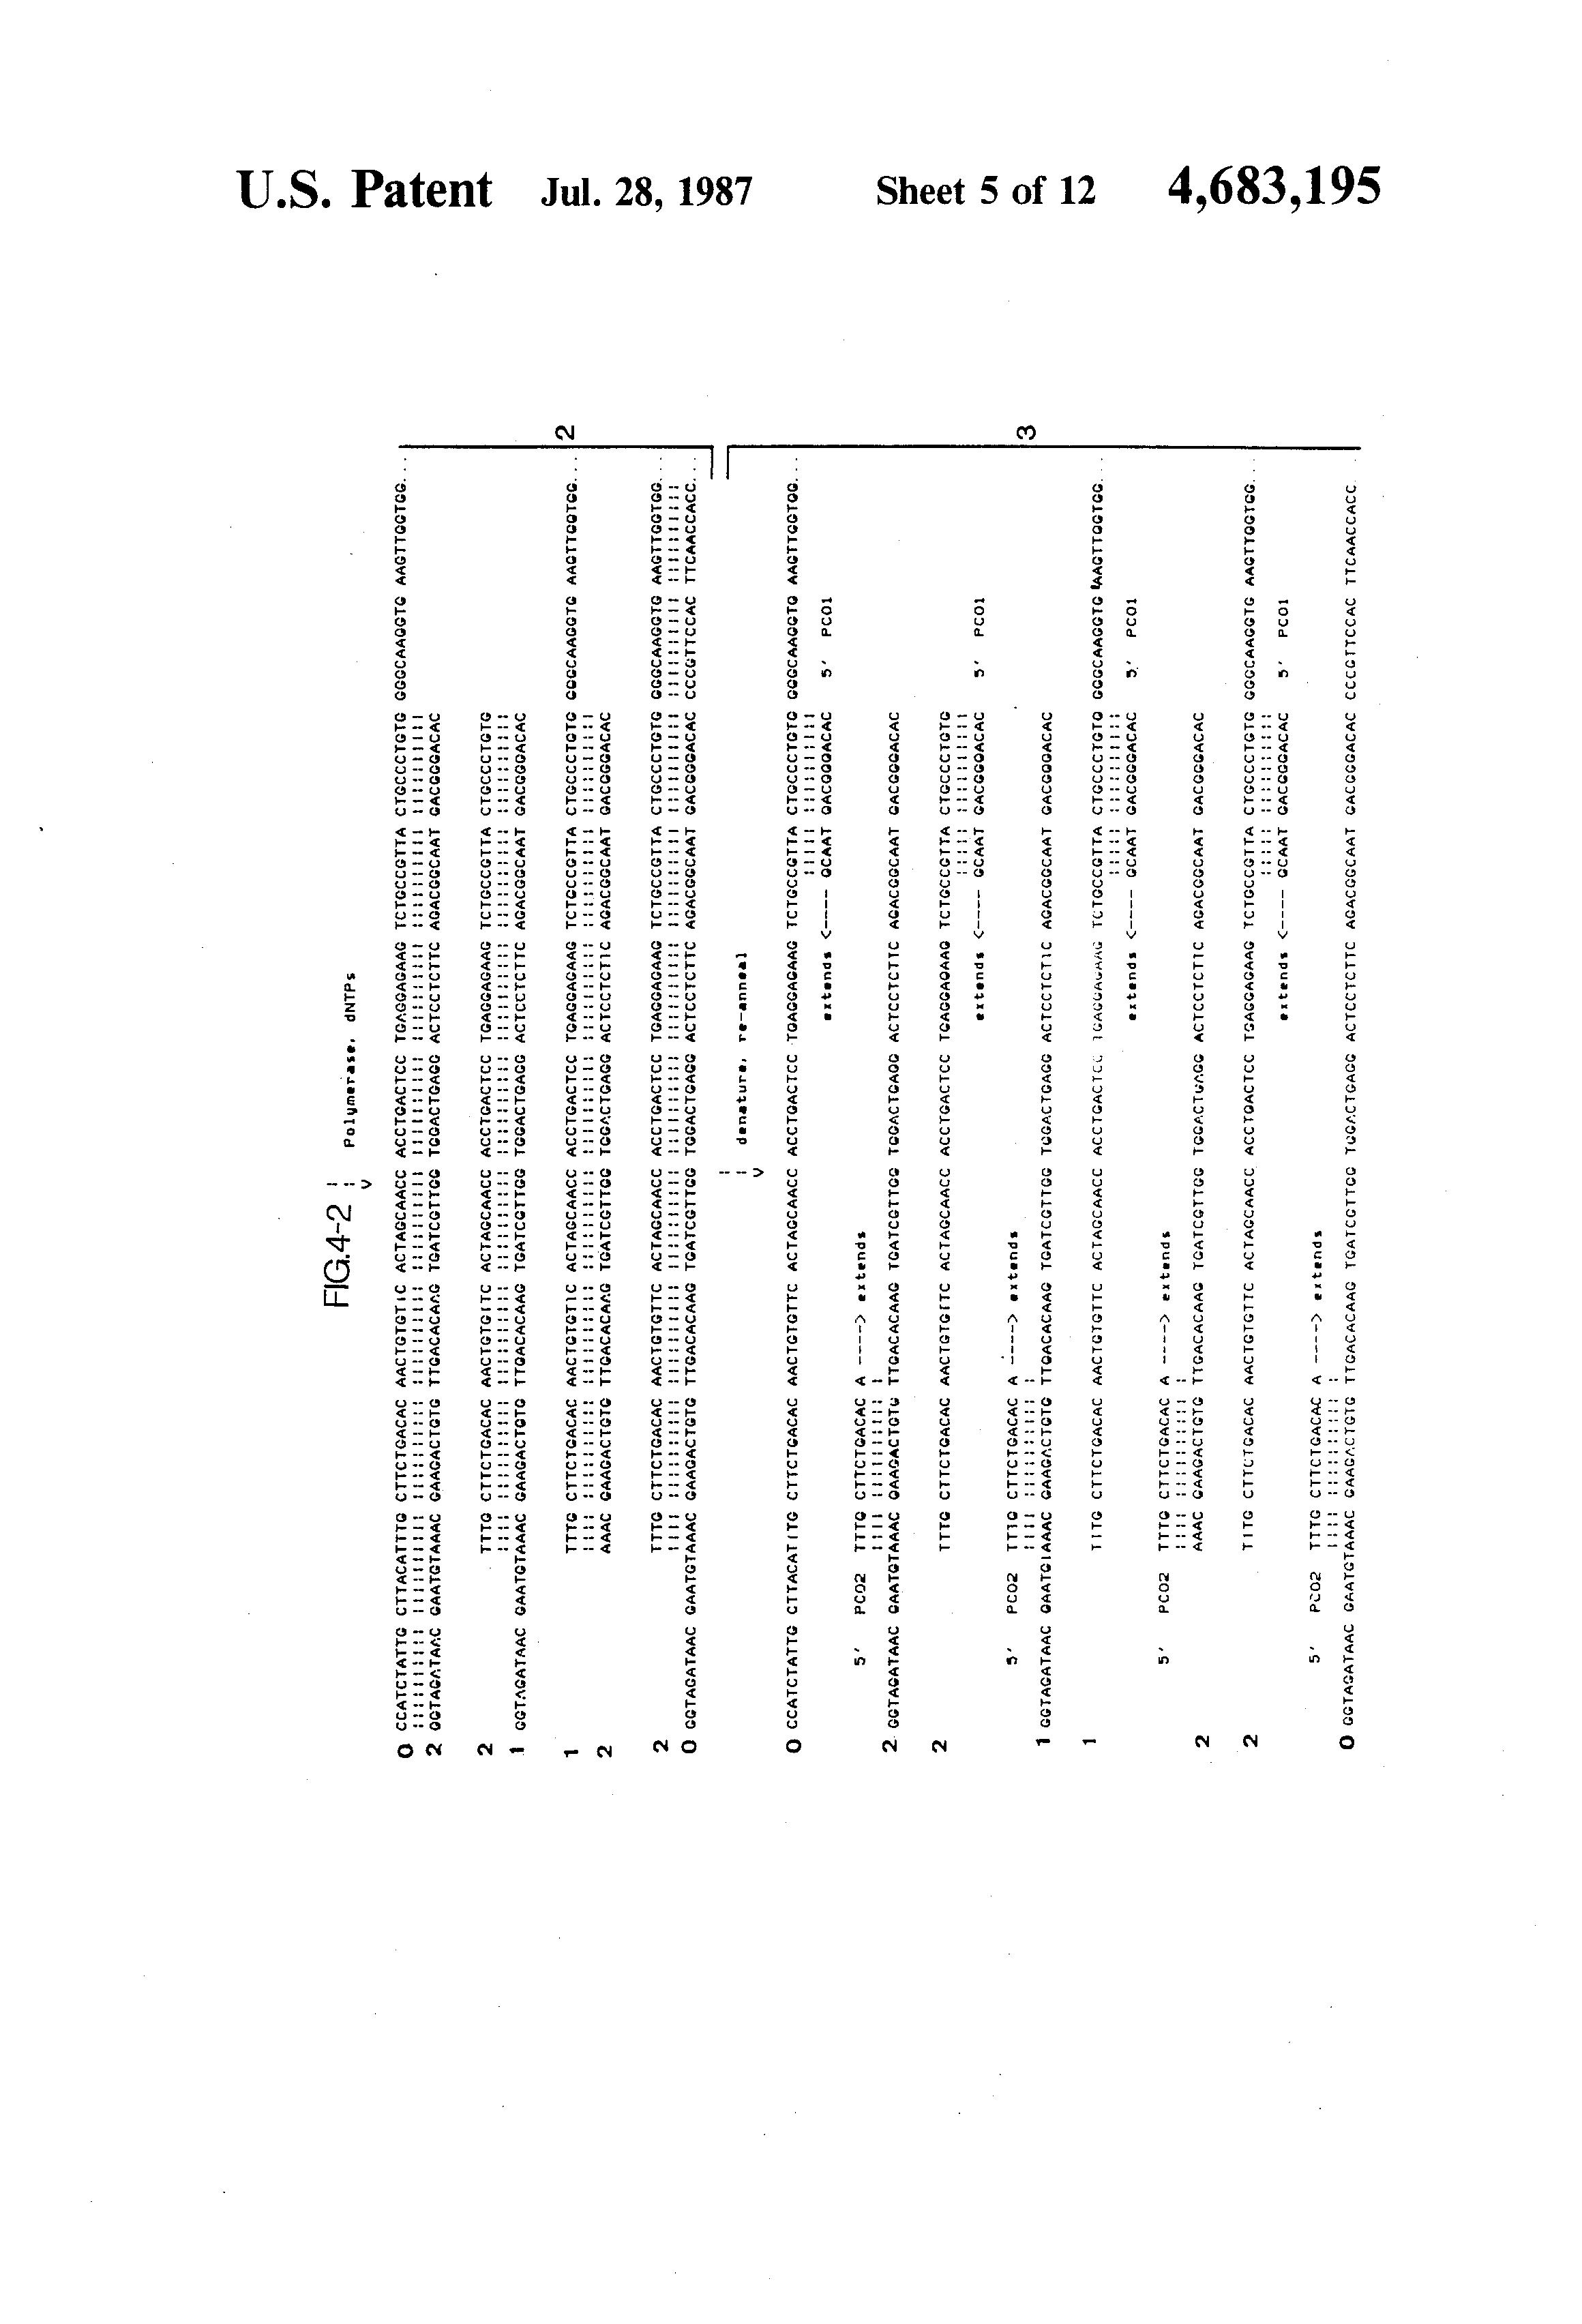 US4683195B1 - - Google Patents